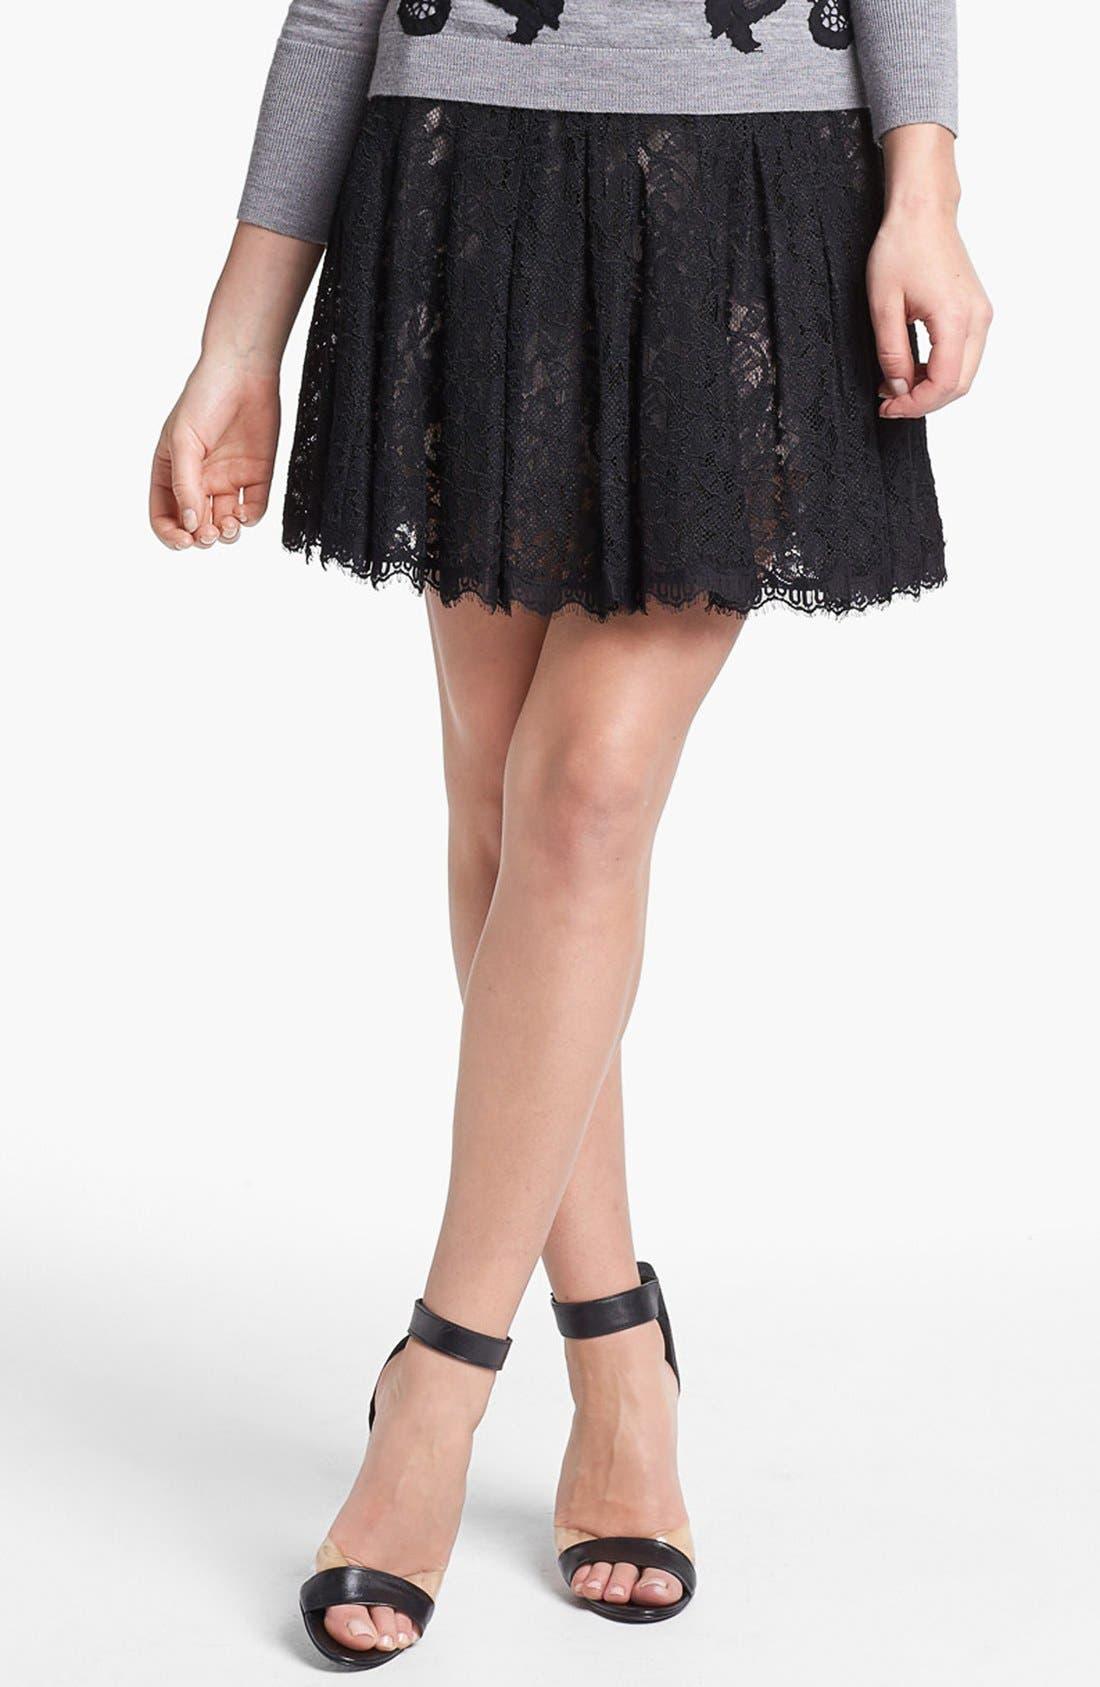 Alternate Image 1 Selected - Diane von Furstenberg 'Kiernan' Lace Skirt